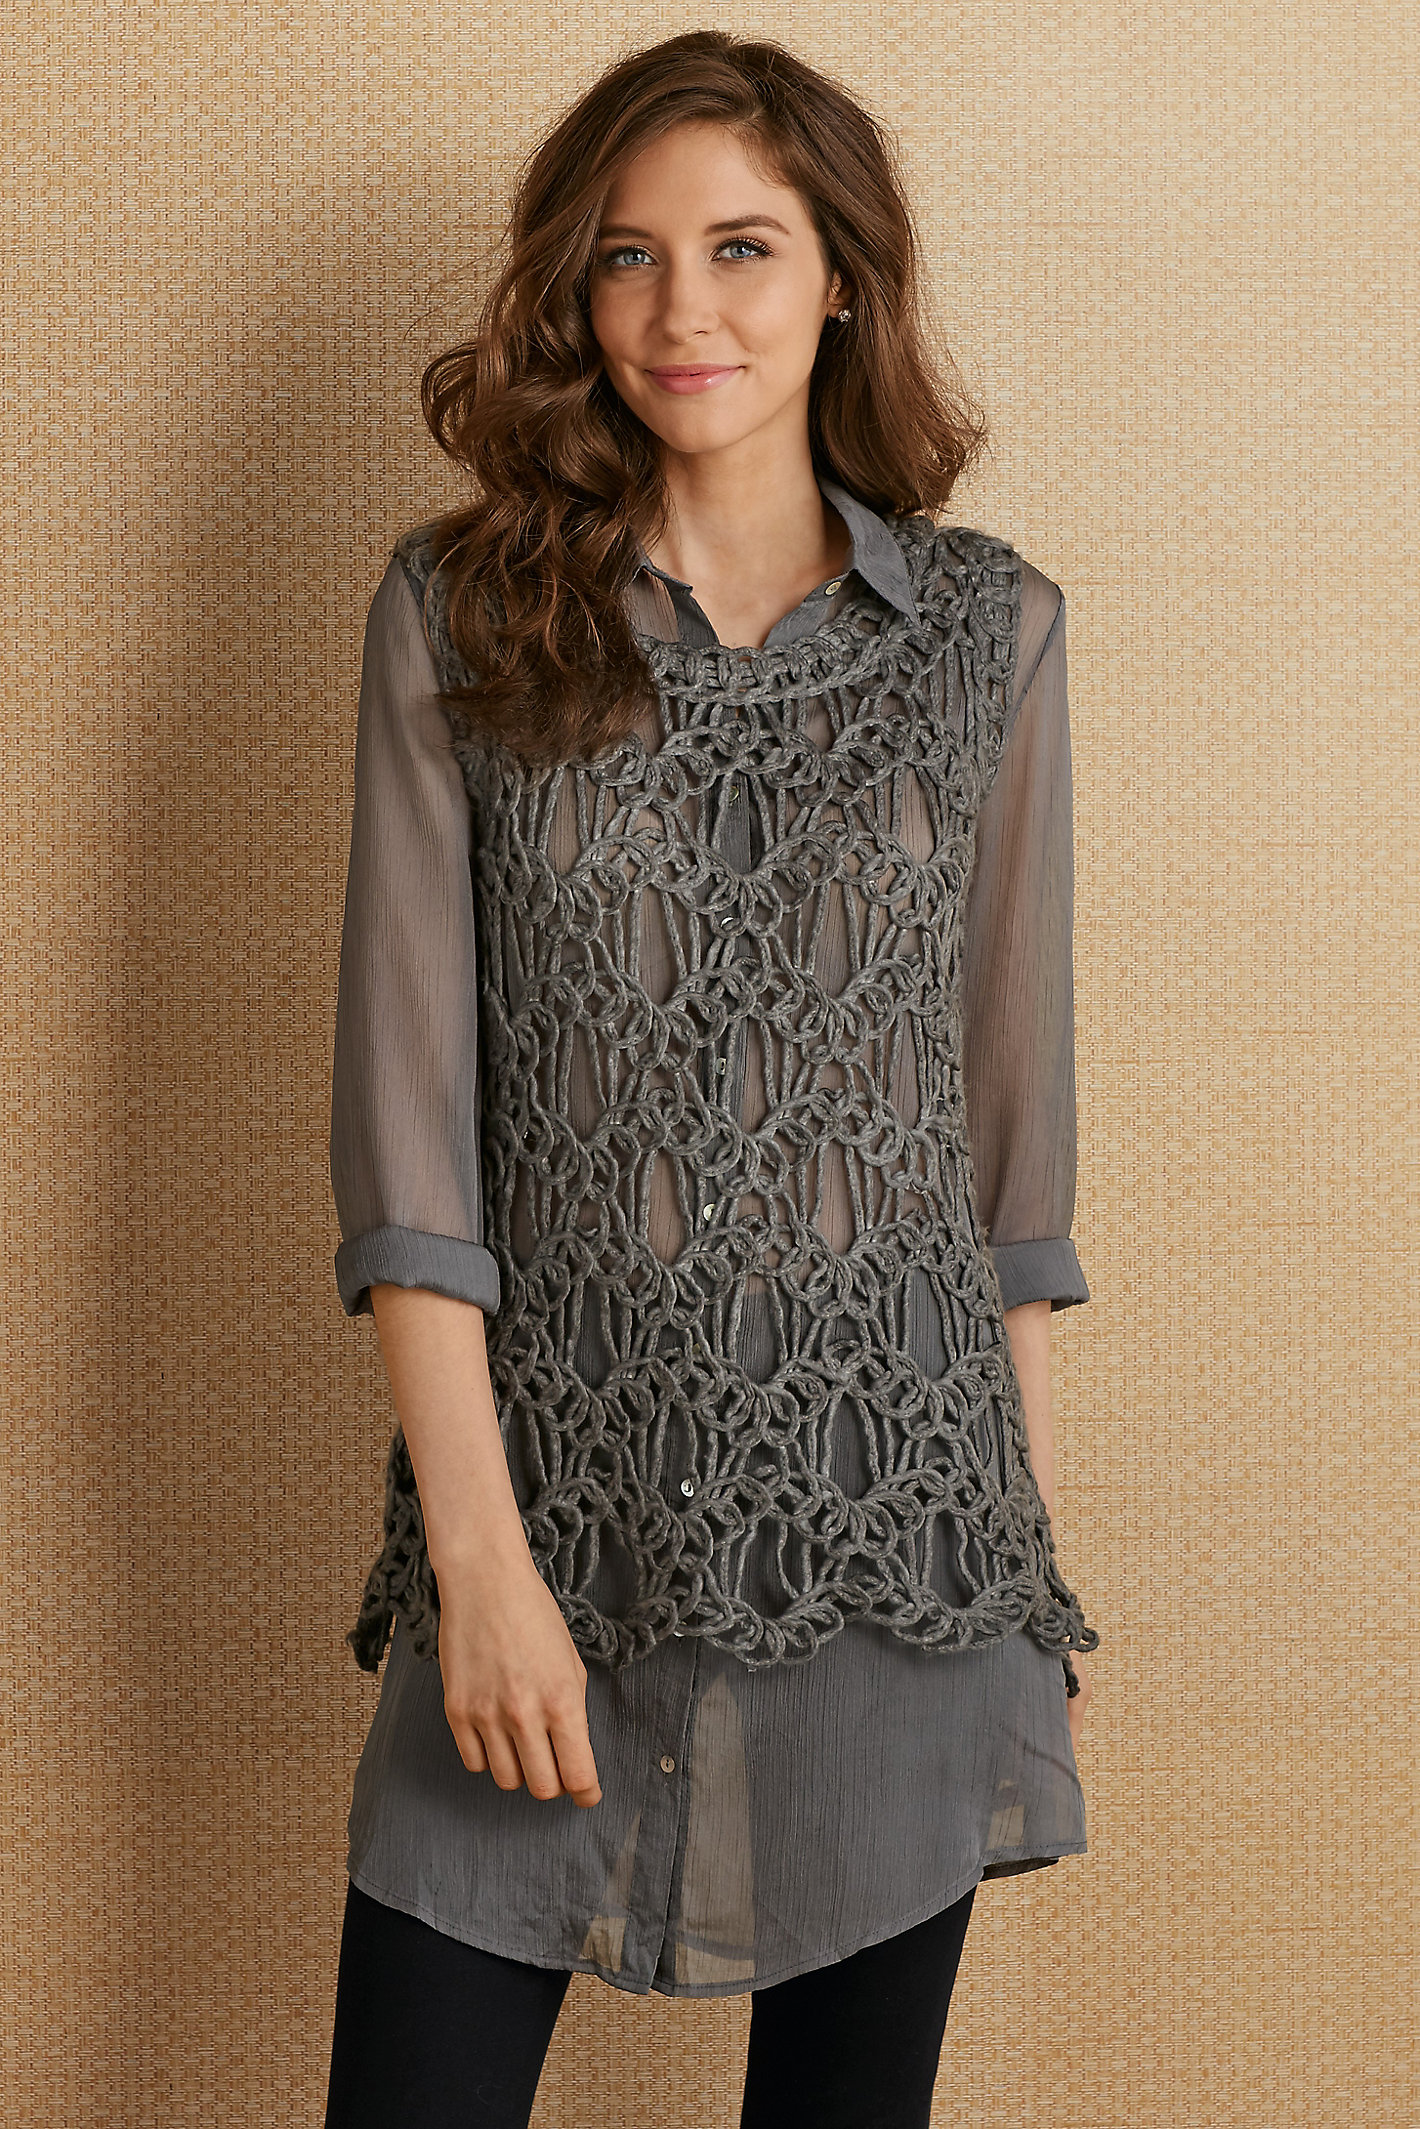 Adelise Shirt & Sweater